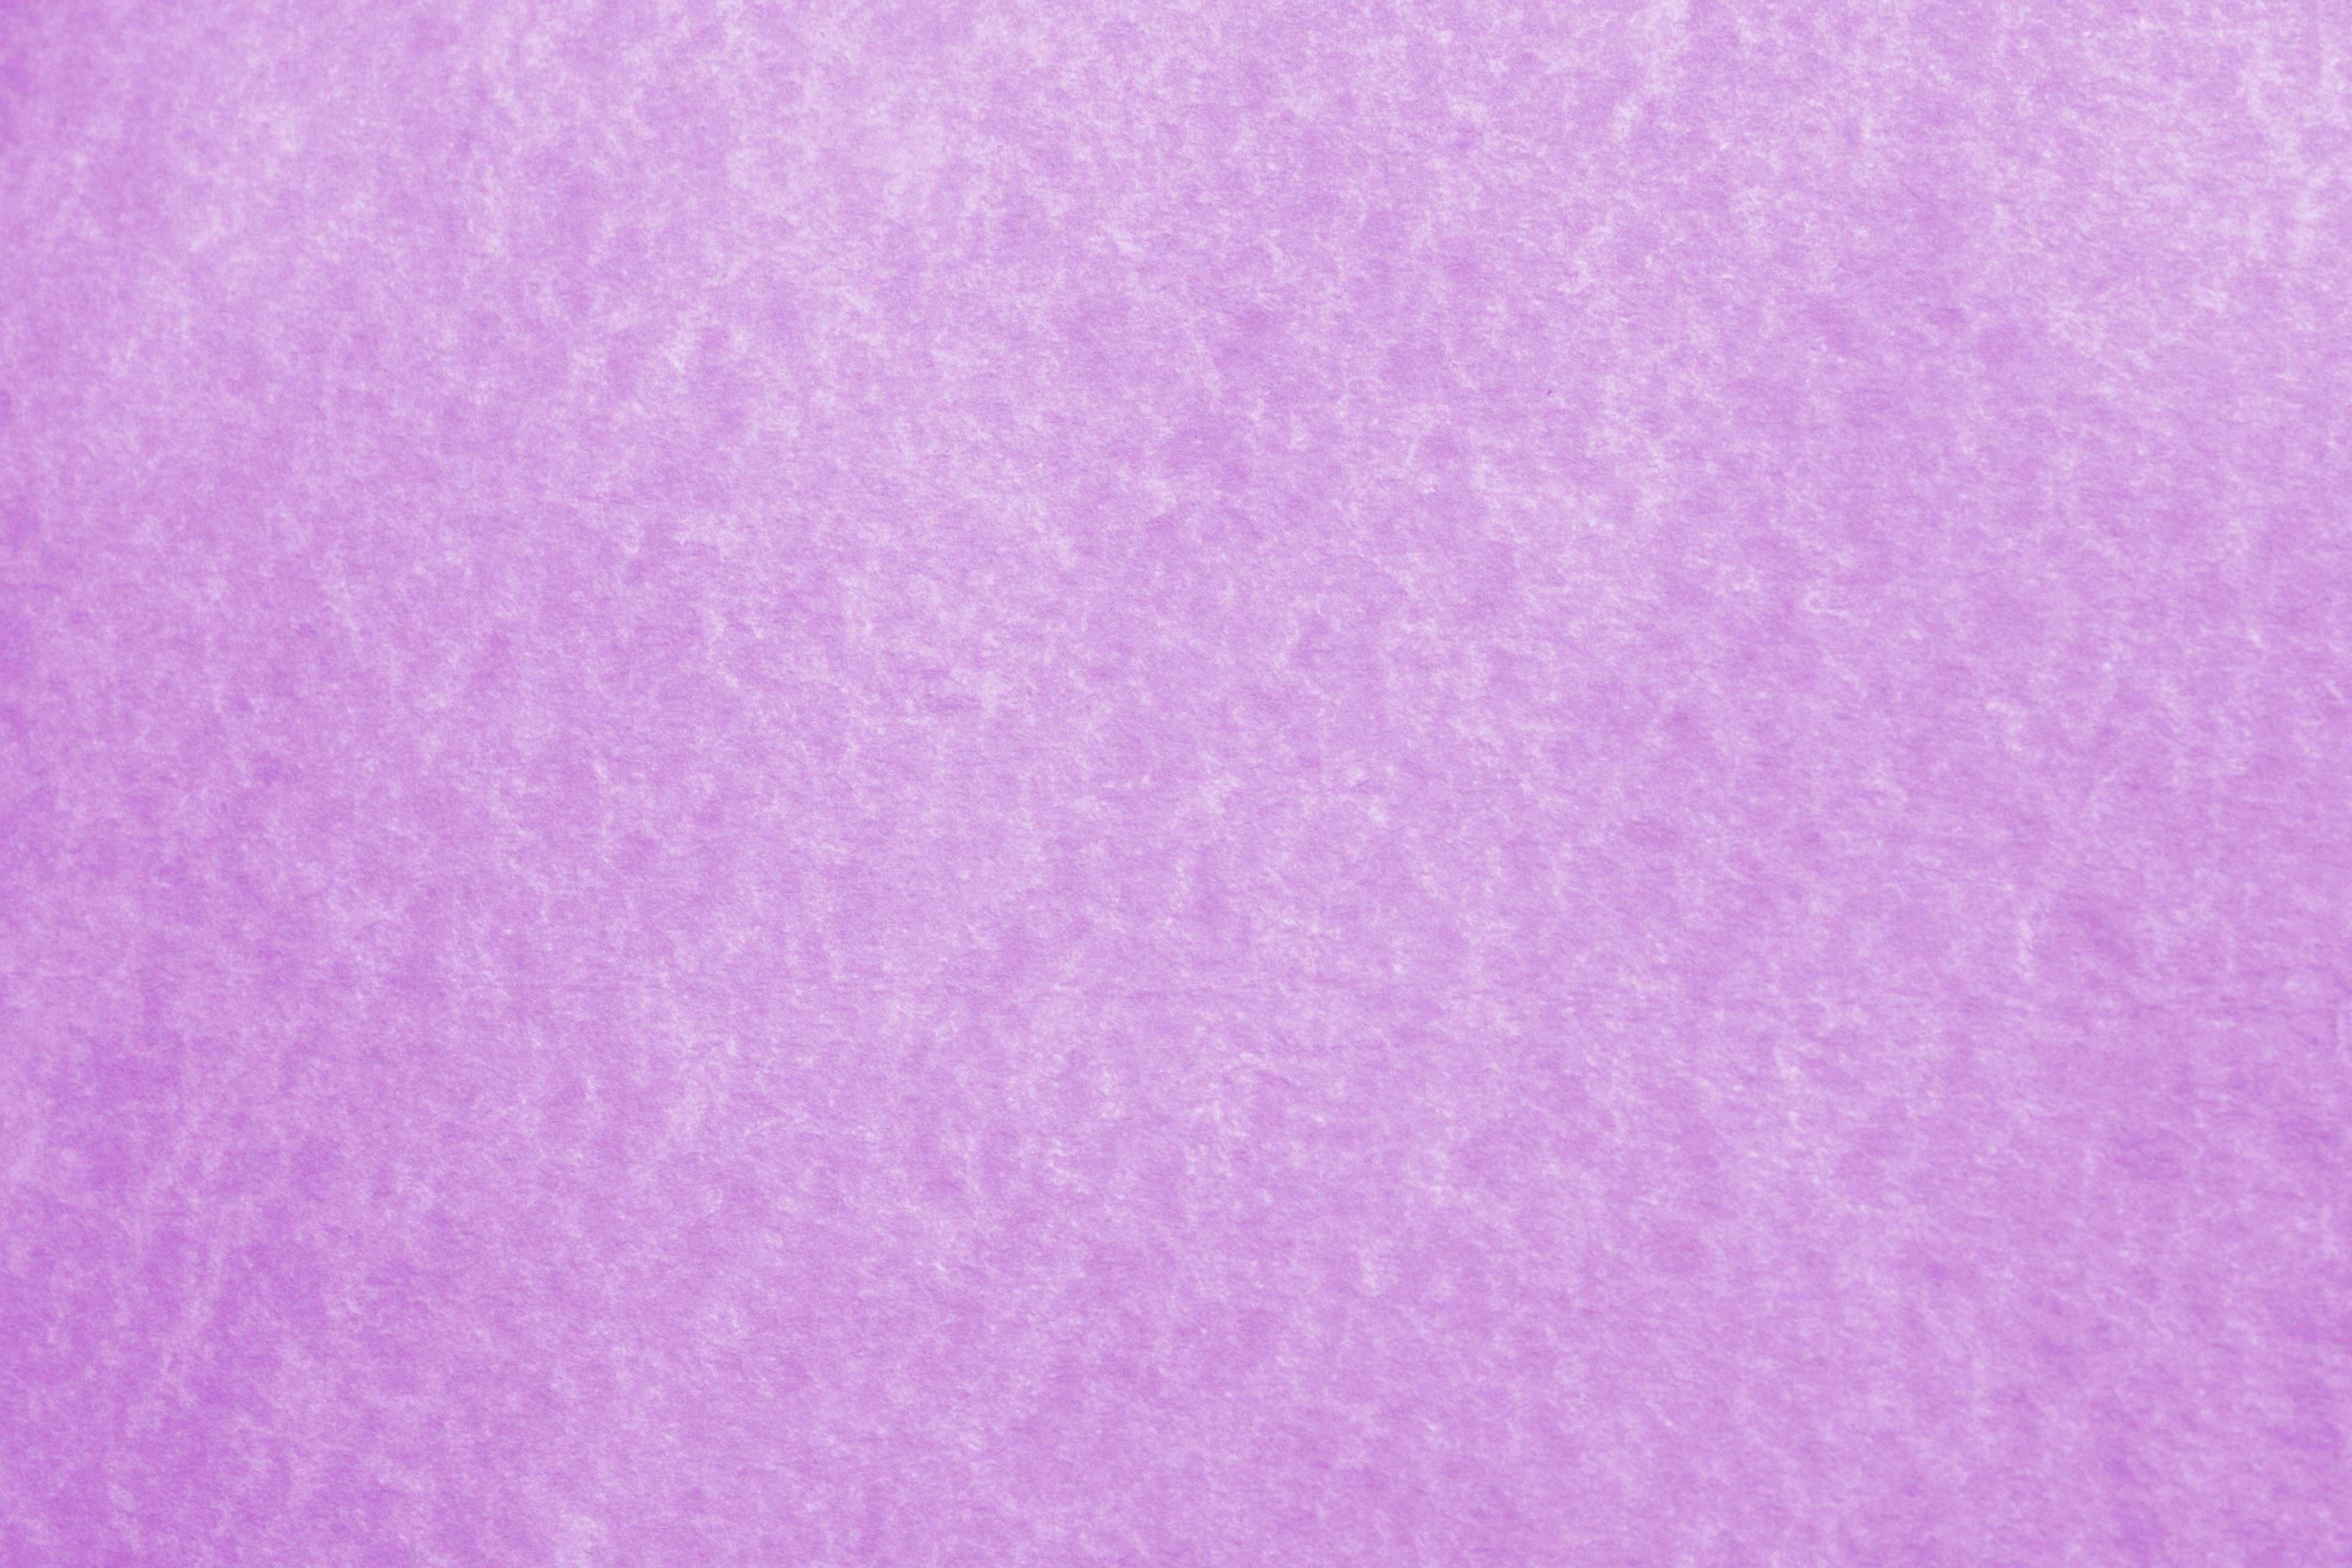 Simple Light Purple Backgrounds Hd Desktop 9 Hd Wallpapers Hdimges